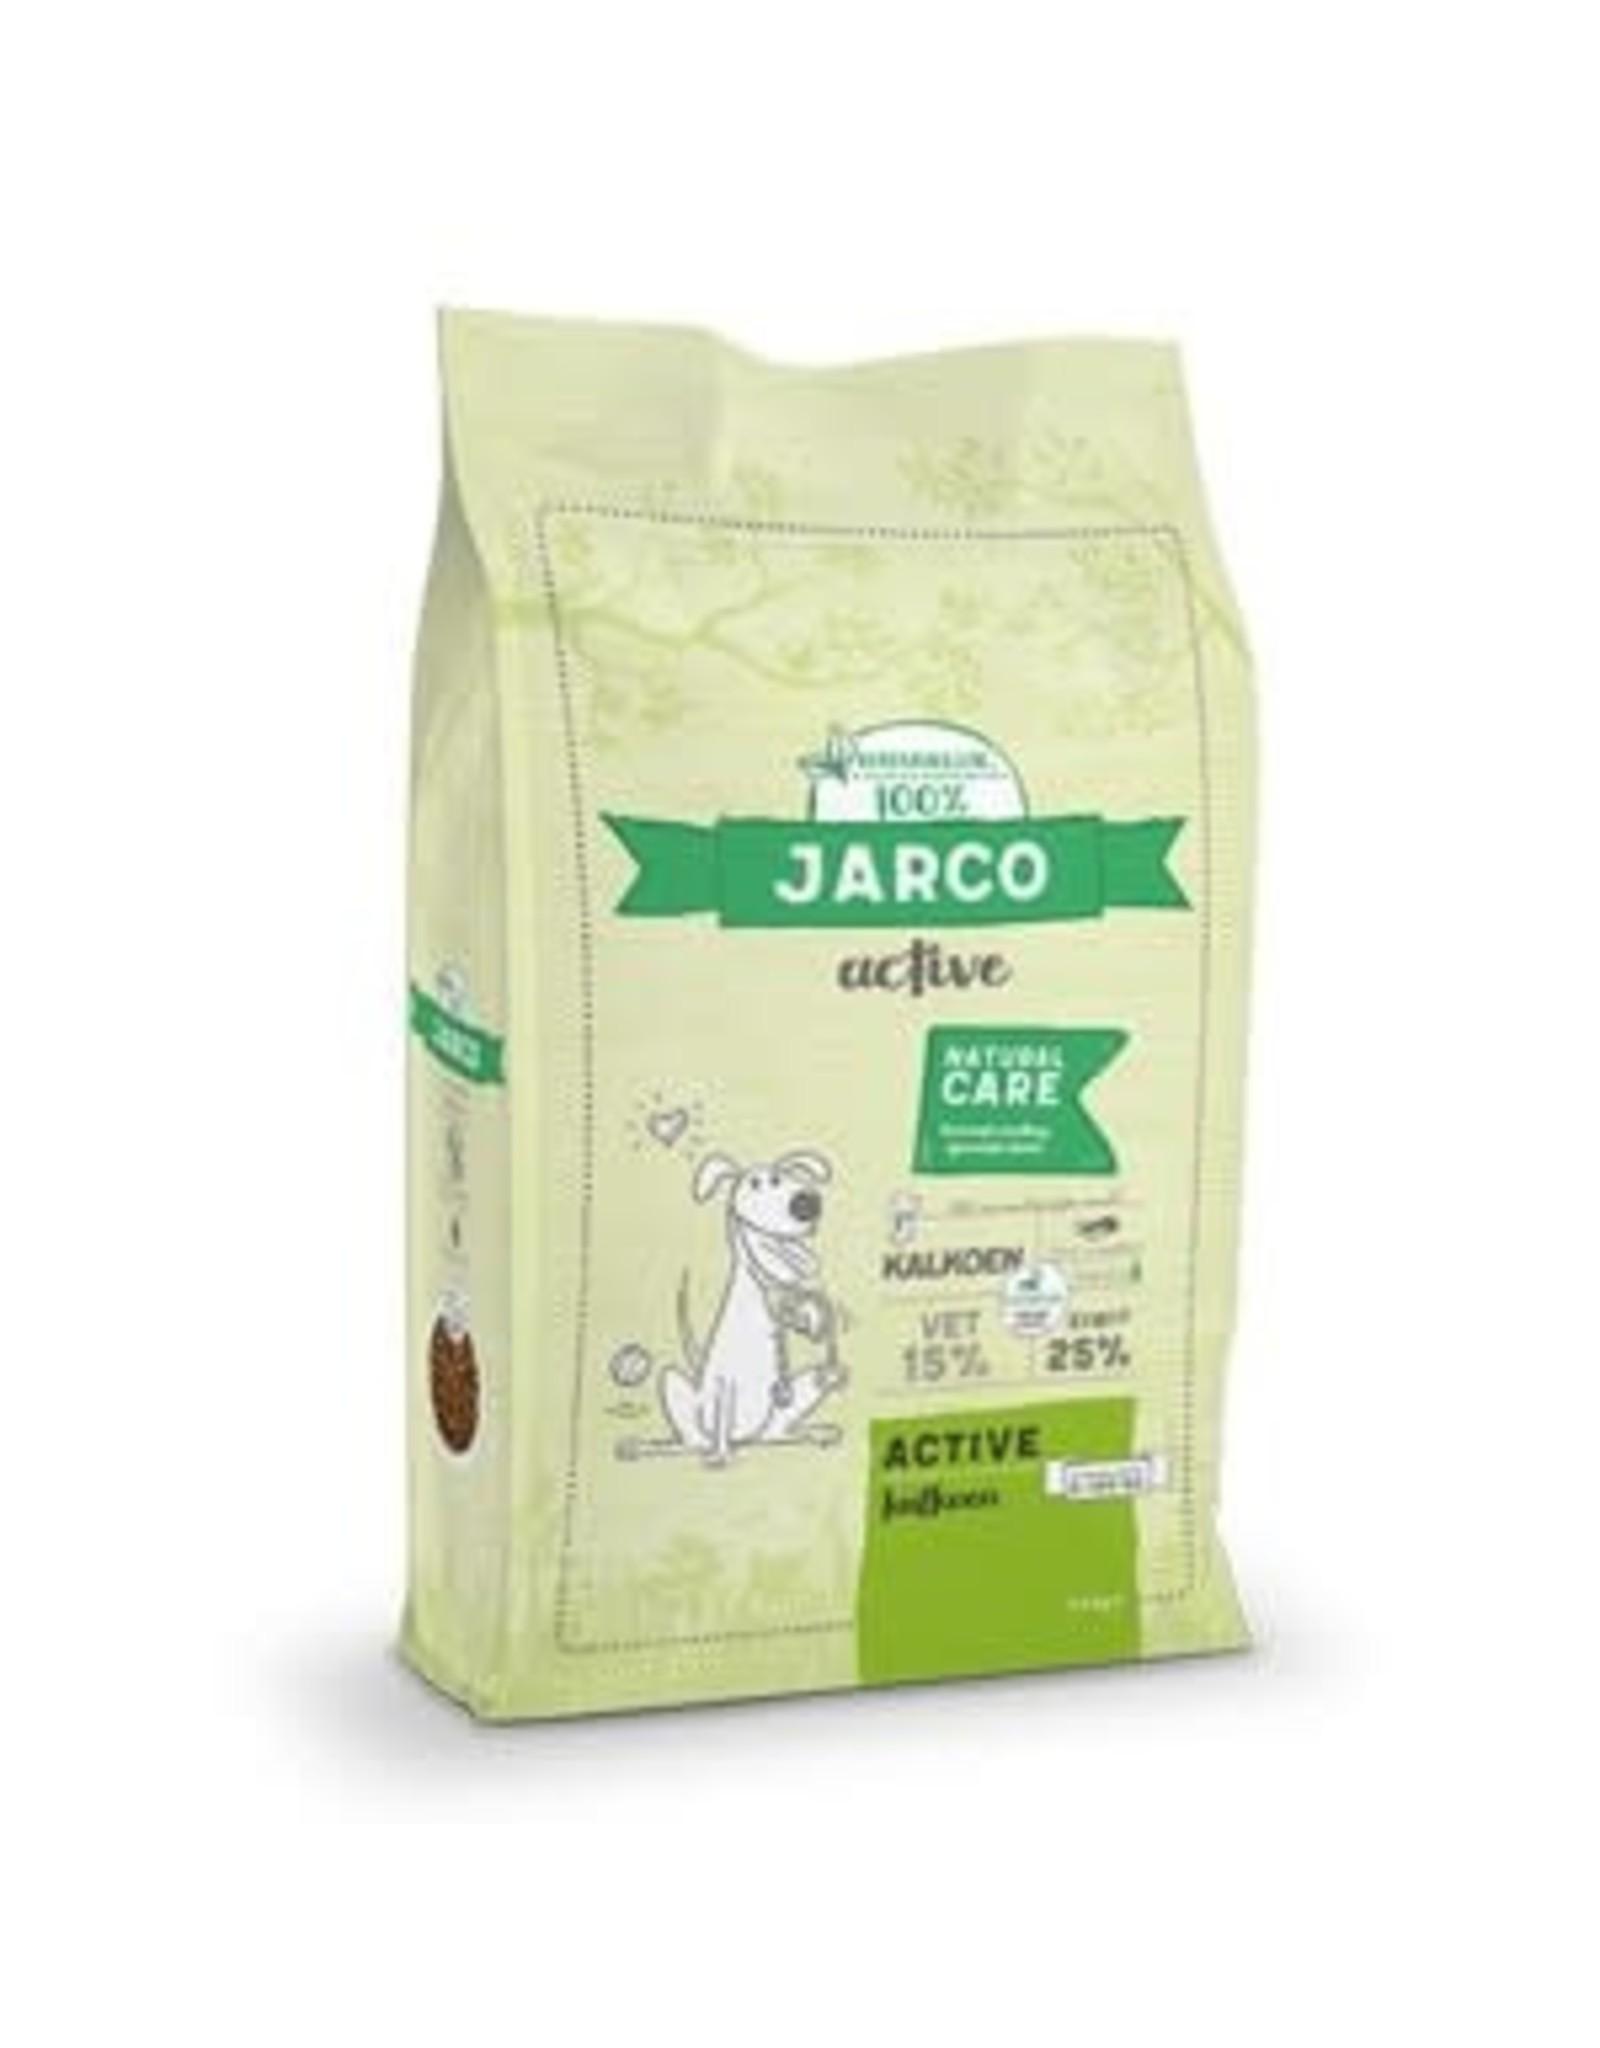 Jarco Specials Active 2-100 Kg - 12,5Kg